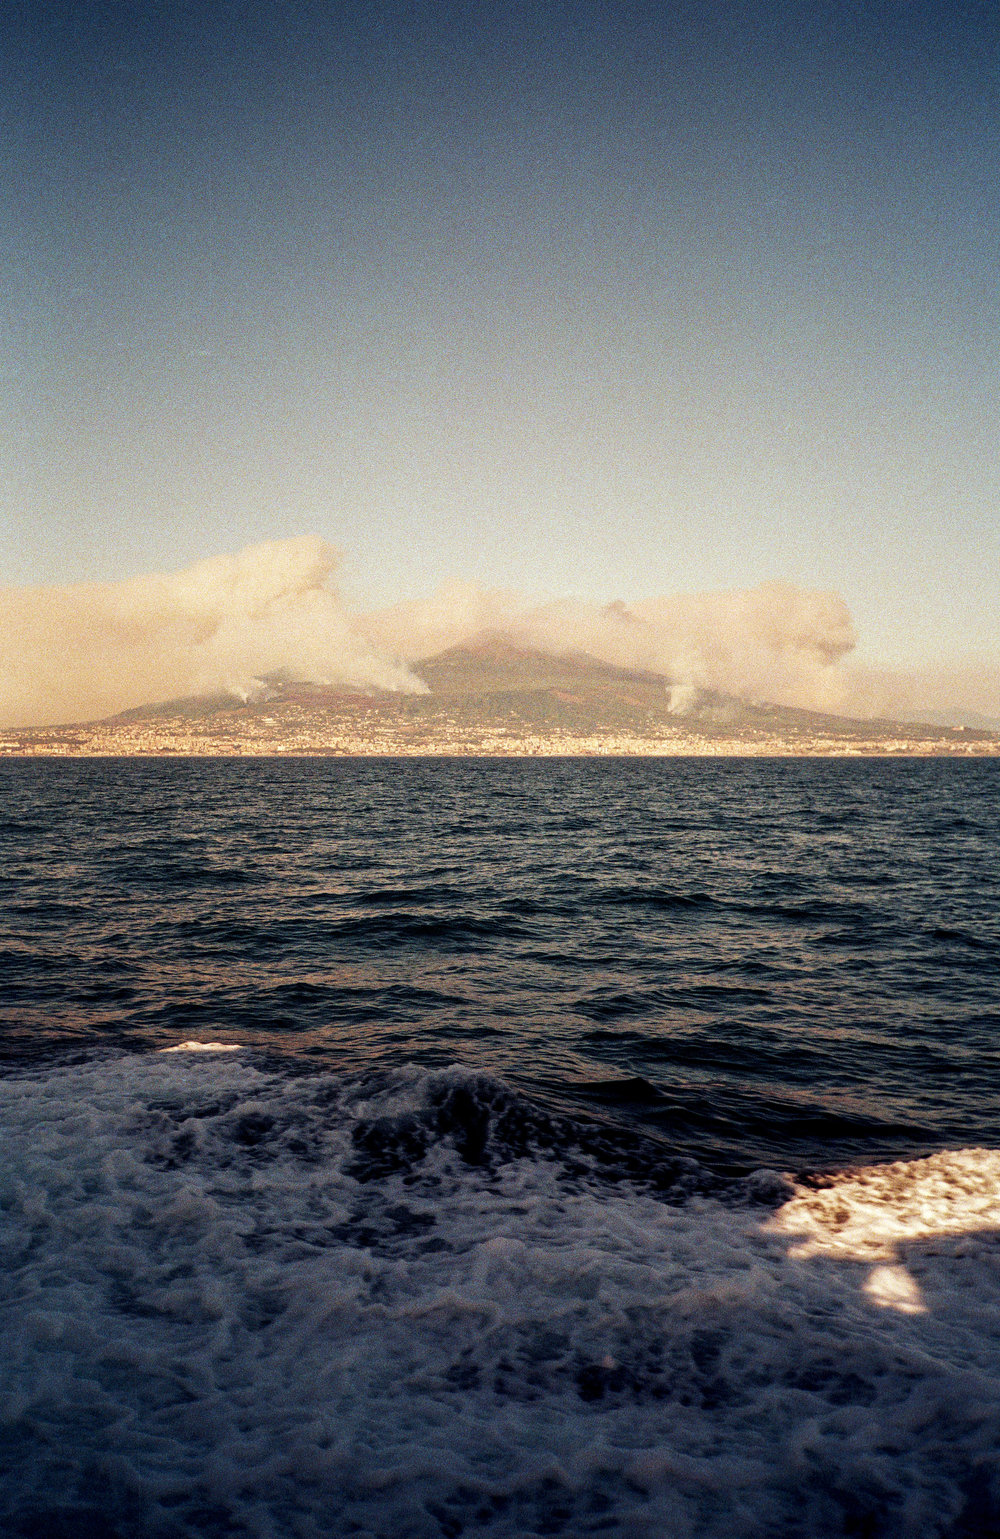 Naples-Capri-18.jpg